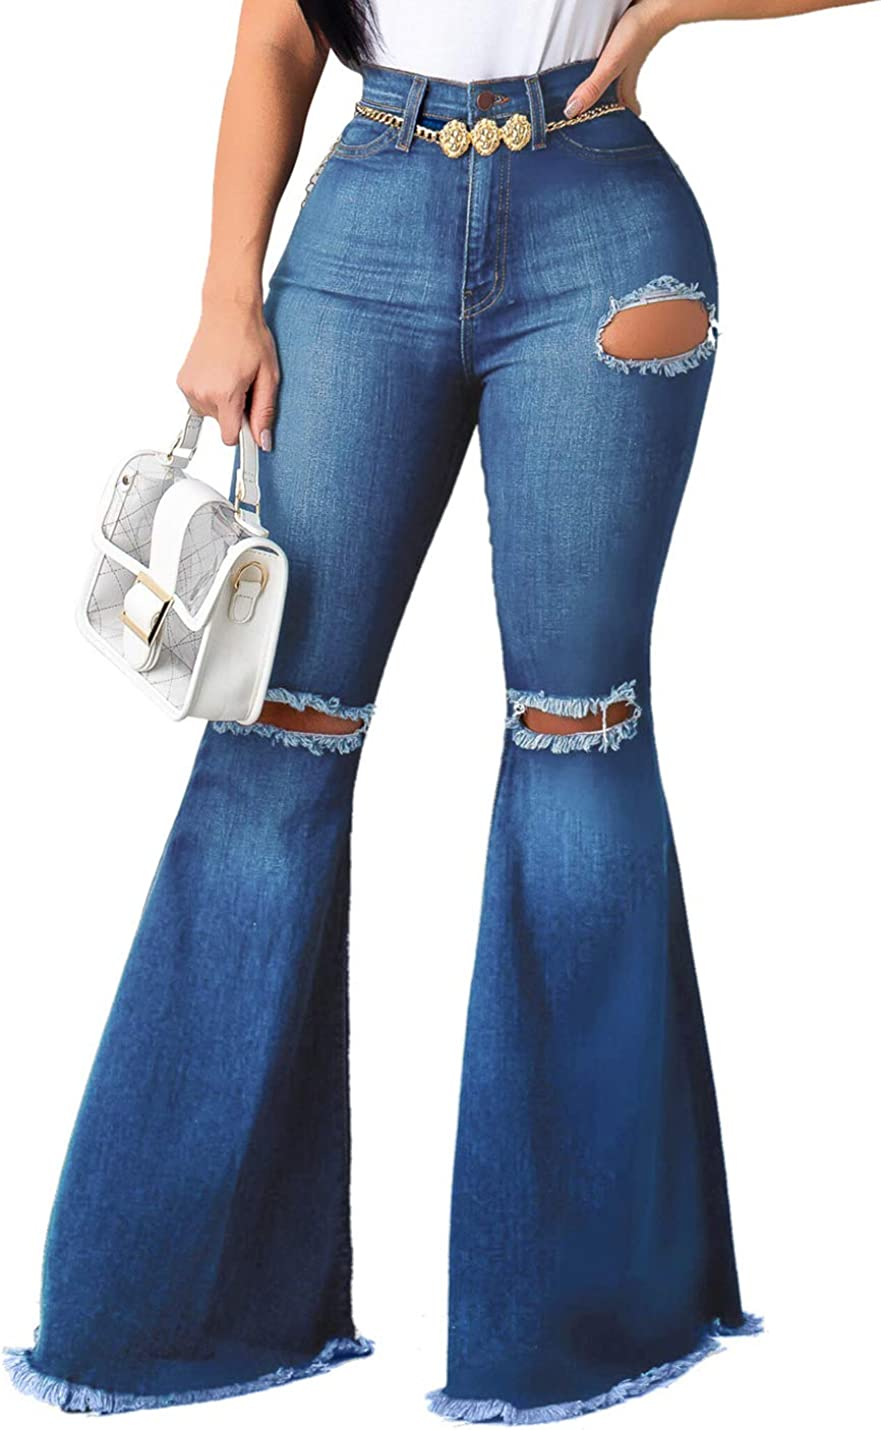 Naliha Pantalones Vaqueros Para Mujer Corte De Bota Con